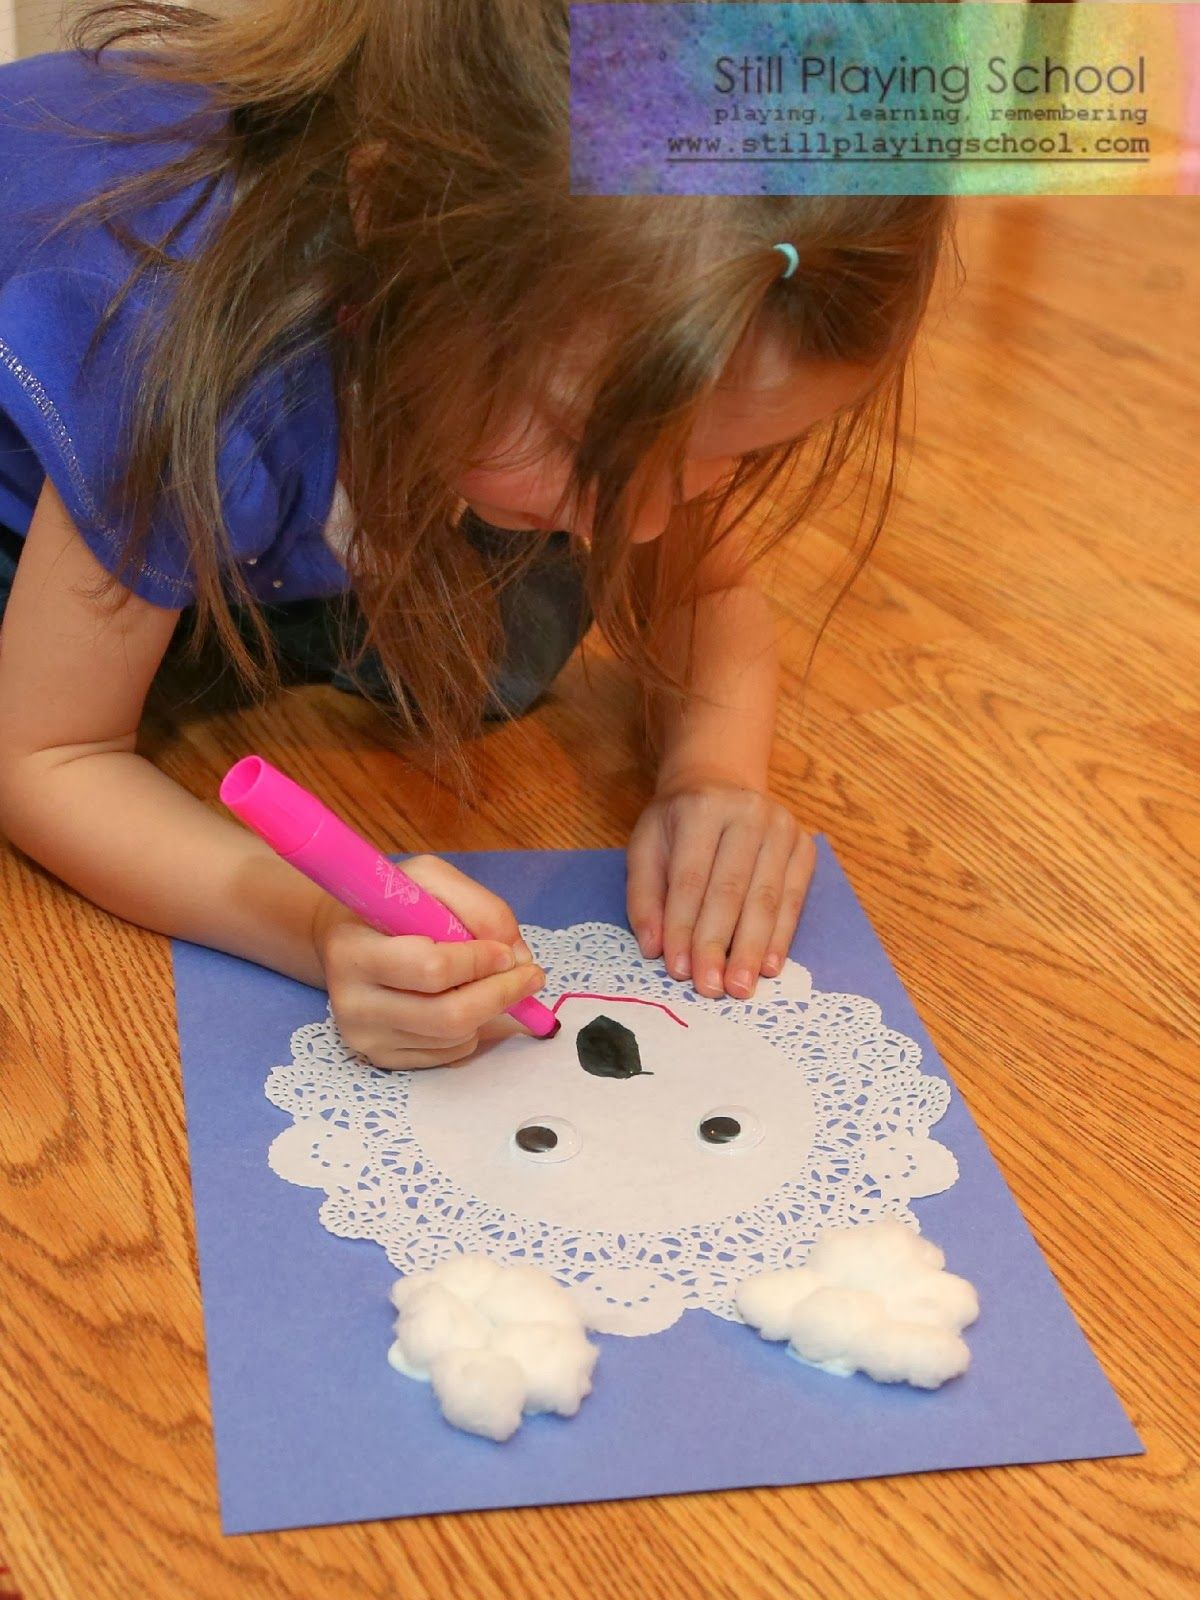 Polar Bear Doily Craft | Still Playing School